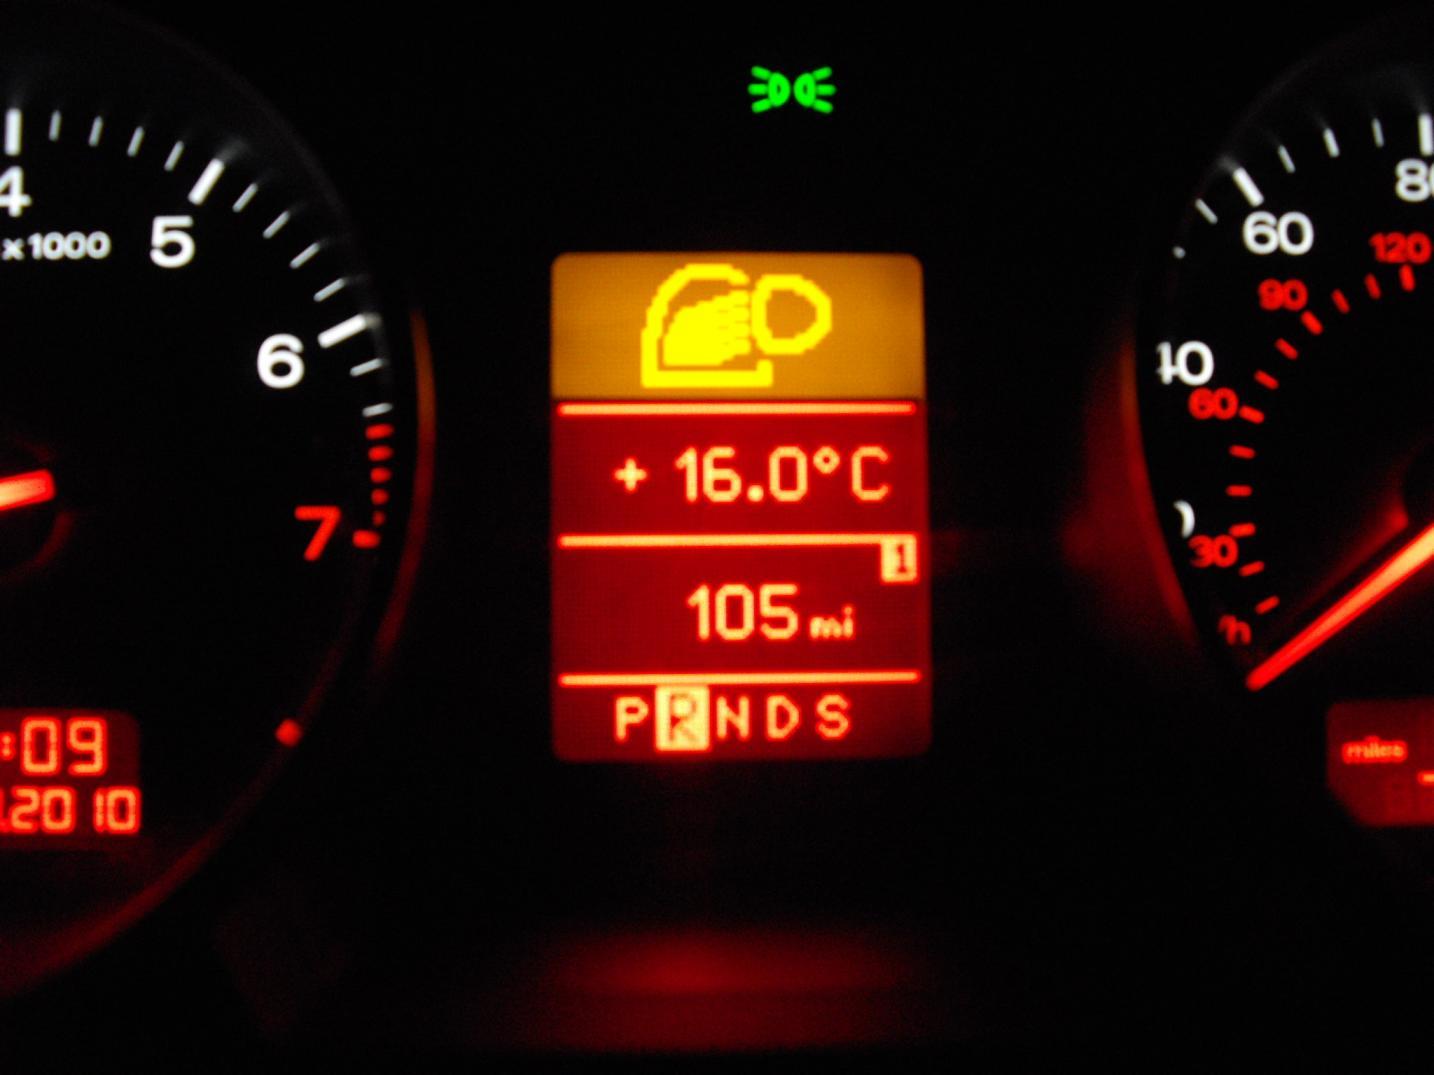 Audi A4 Dashboard Symbols